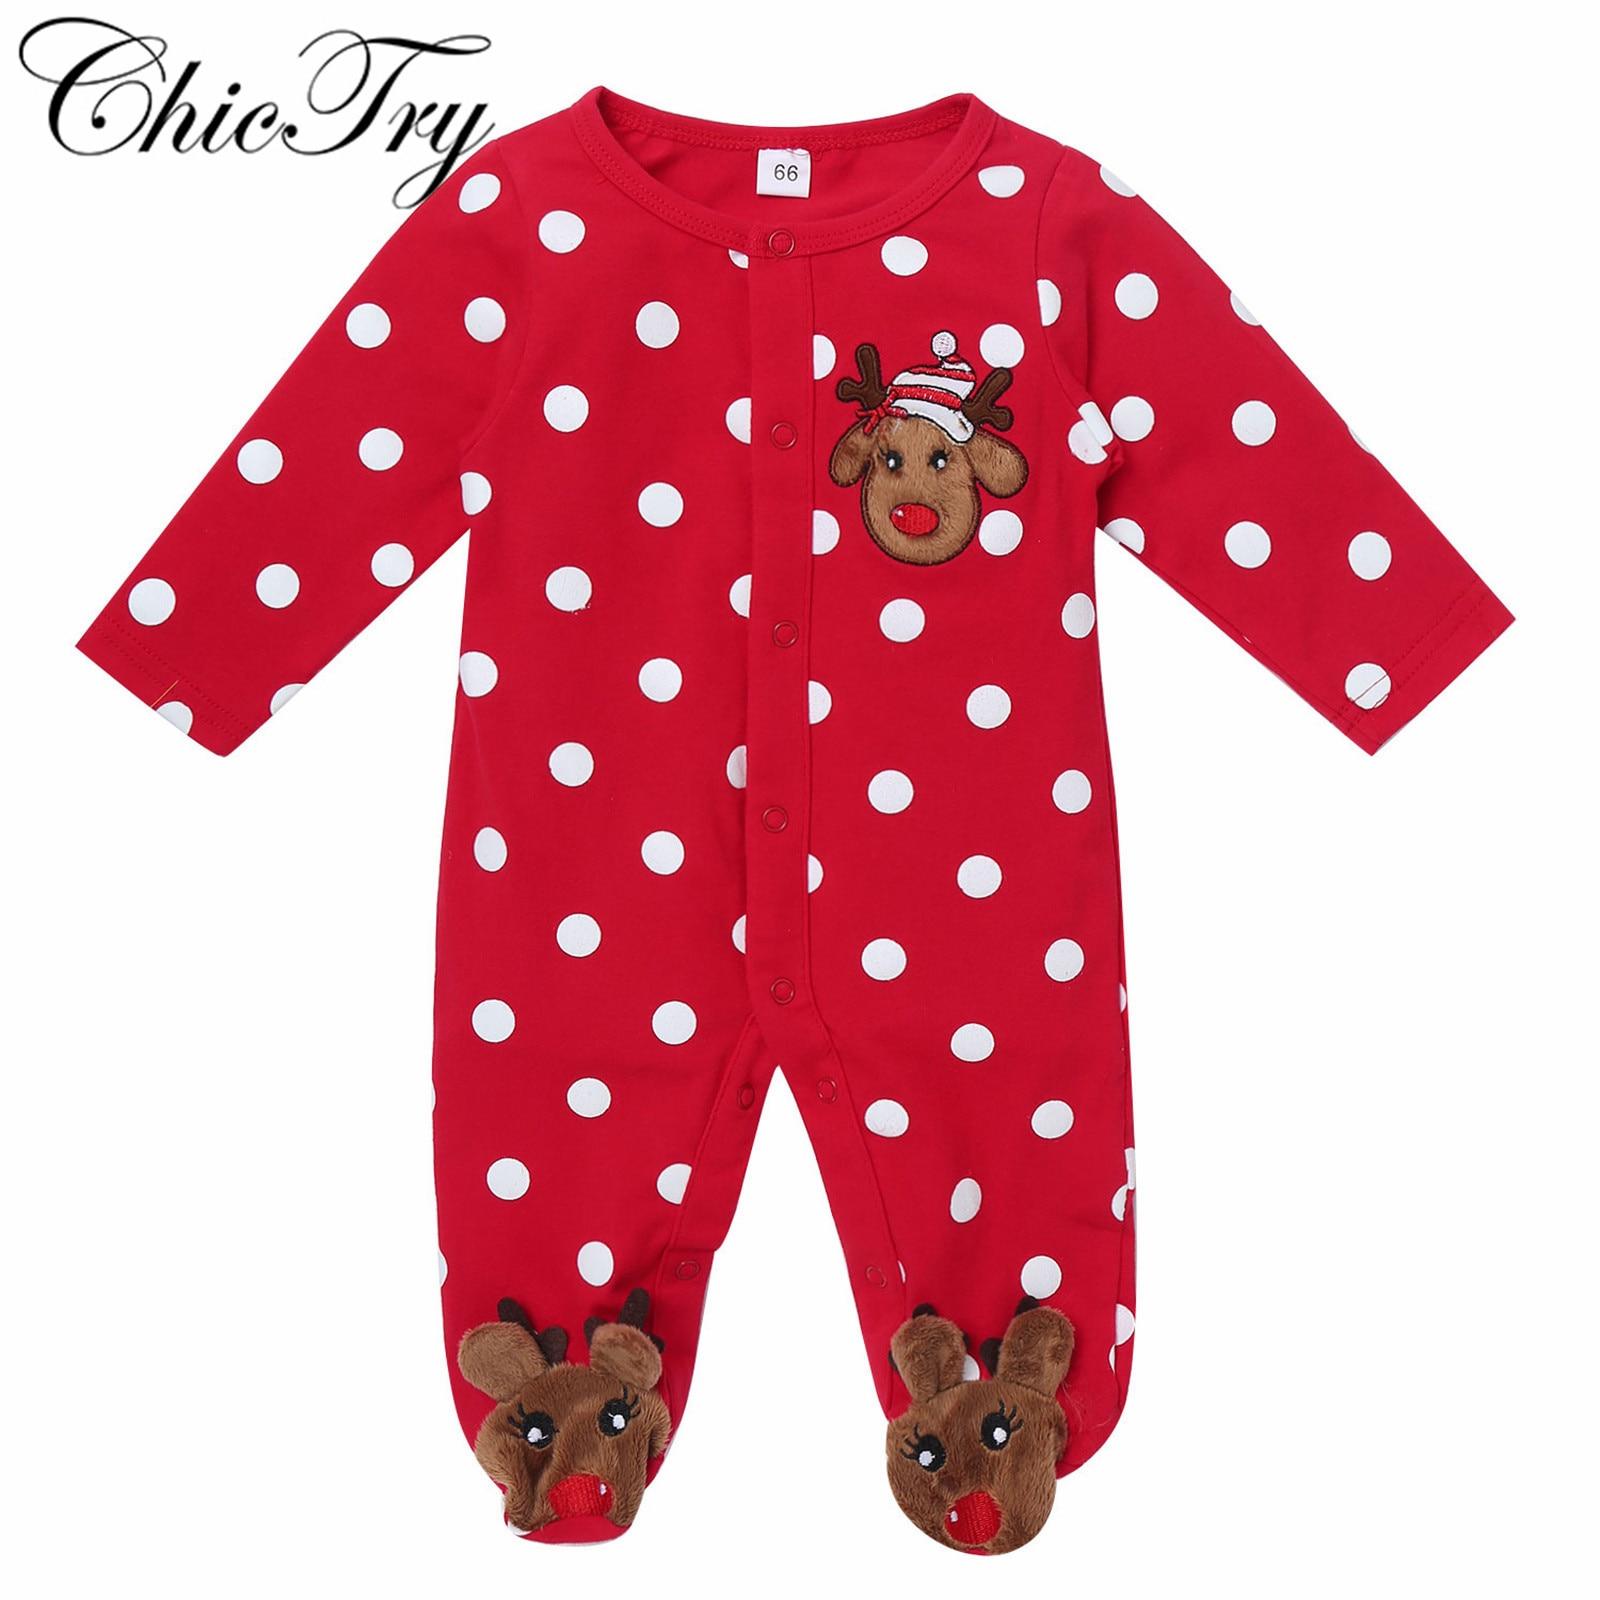 Newborn First Christmas Gift Baby Boy Girl Rompers Newborn Infant Baby Cartoon Deer Red Jumpsuit Pla